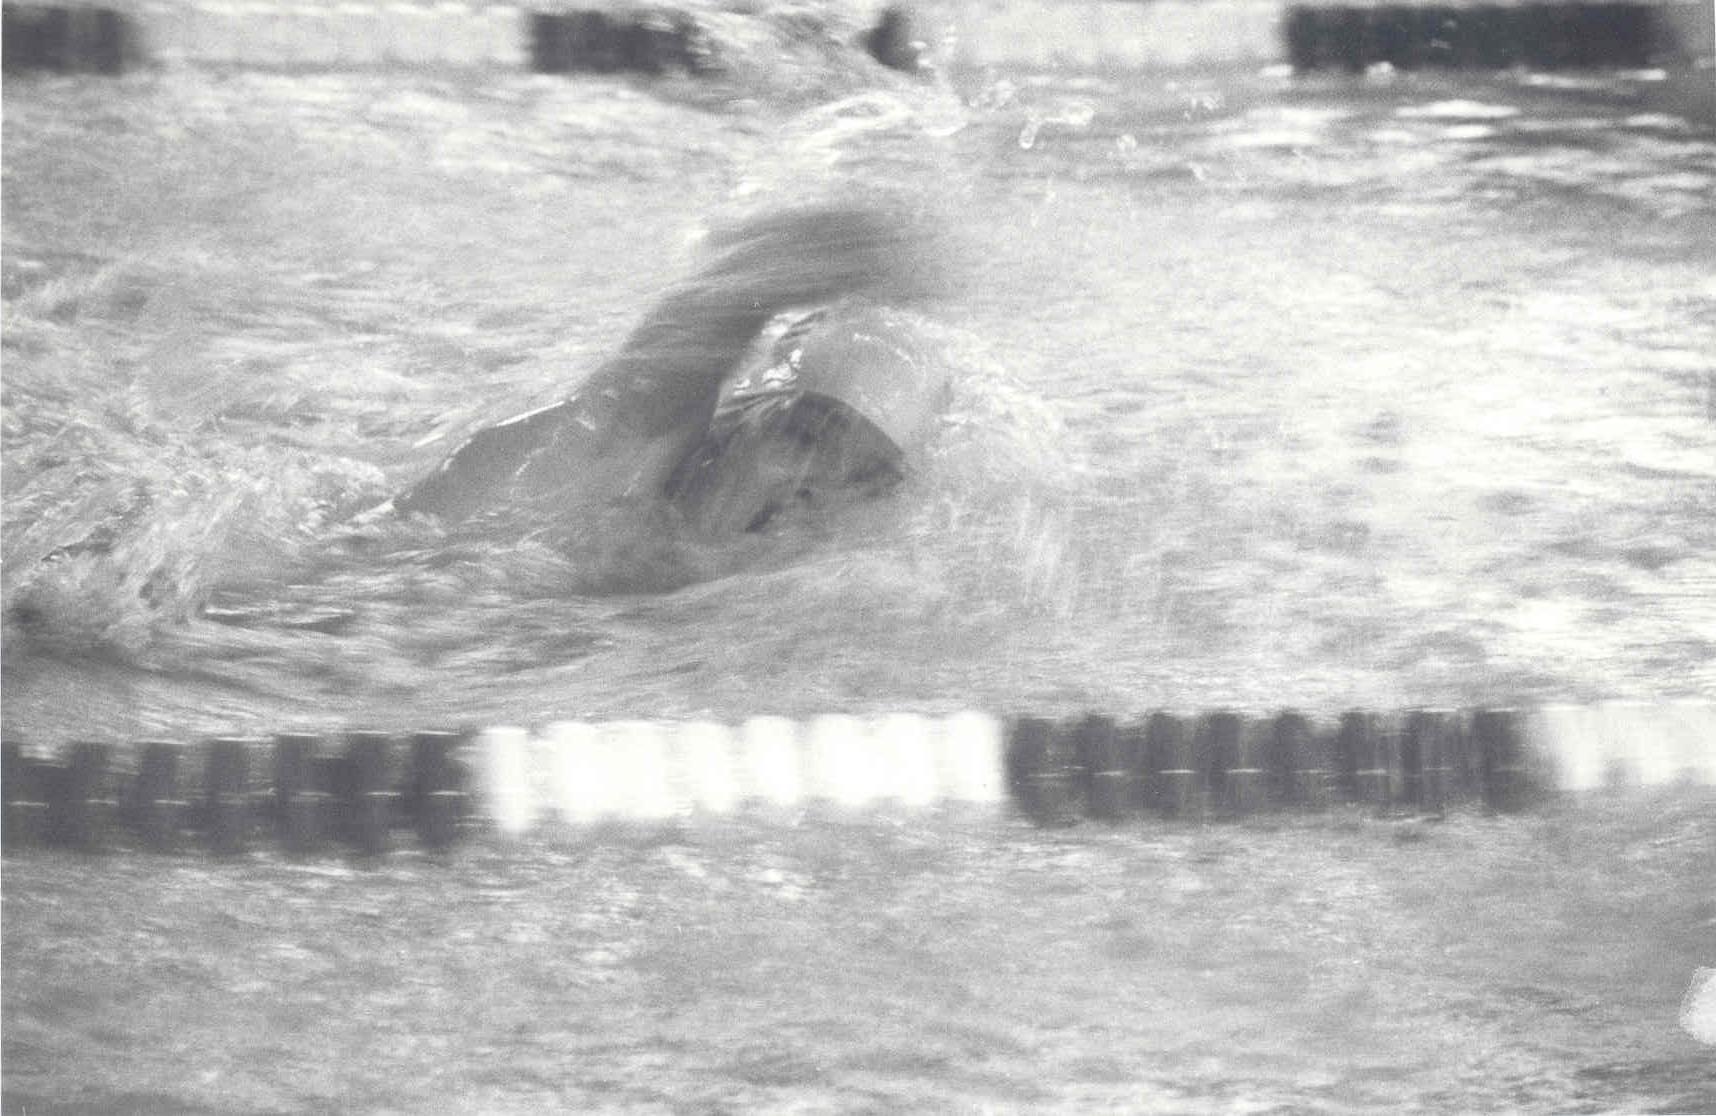 tommy pedersen svømming